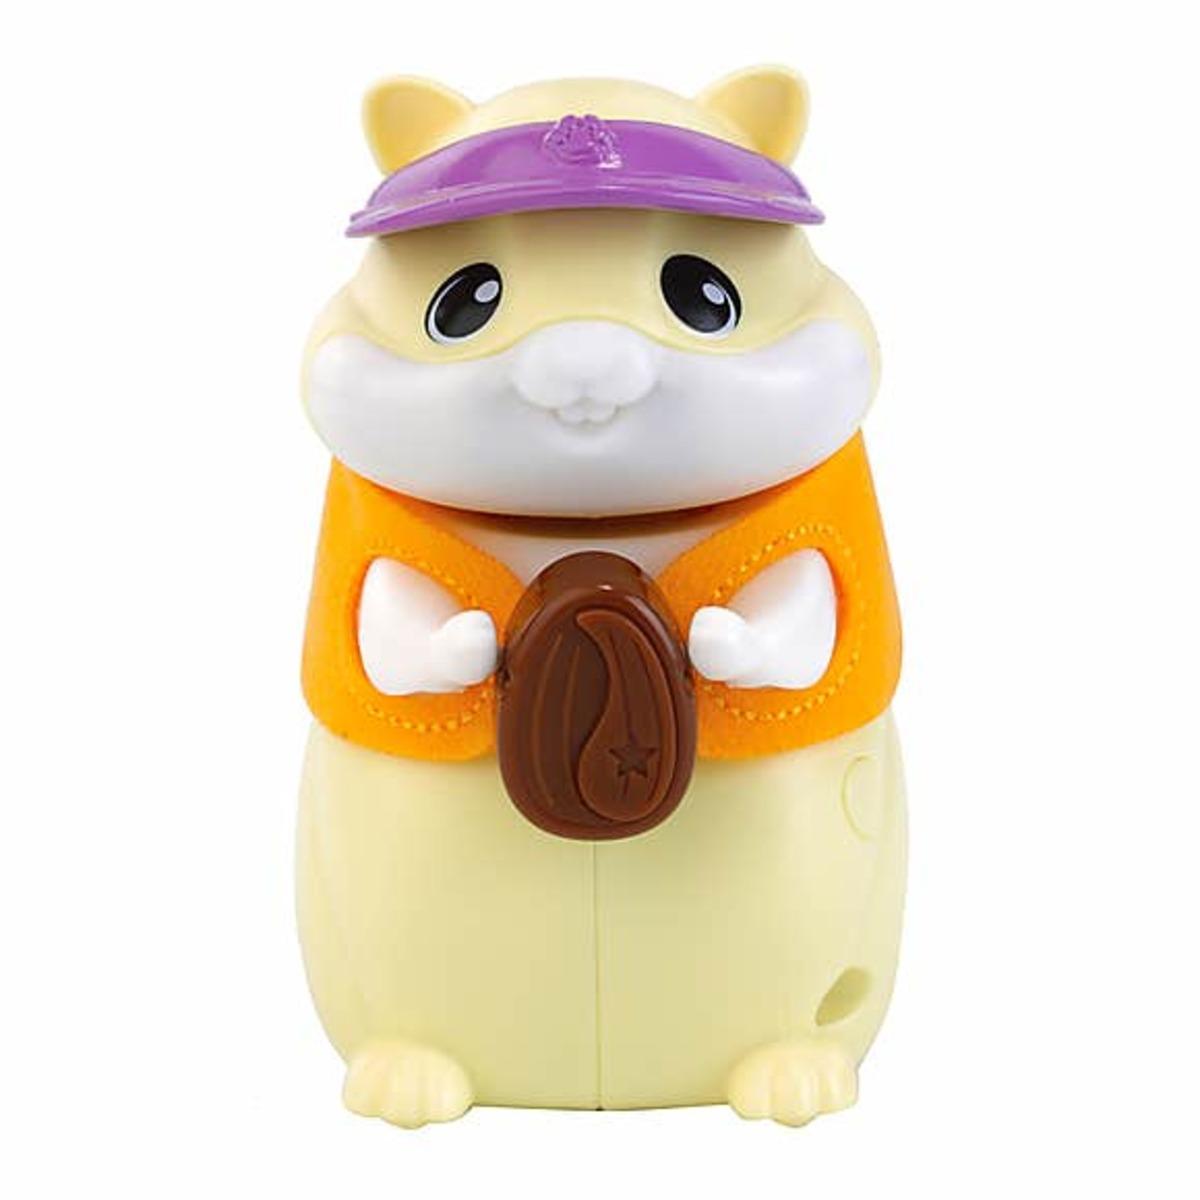 VTech PetSqueaks Hamster - Sunny